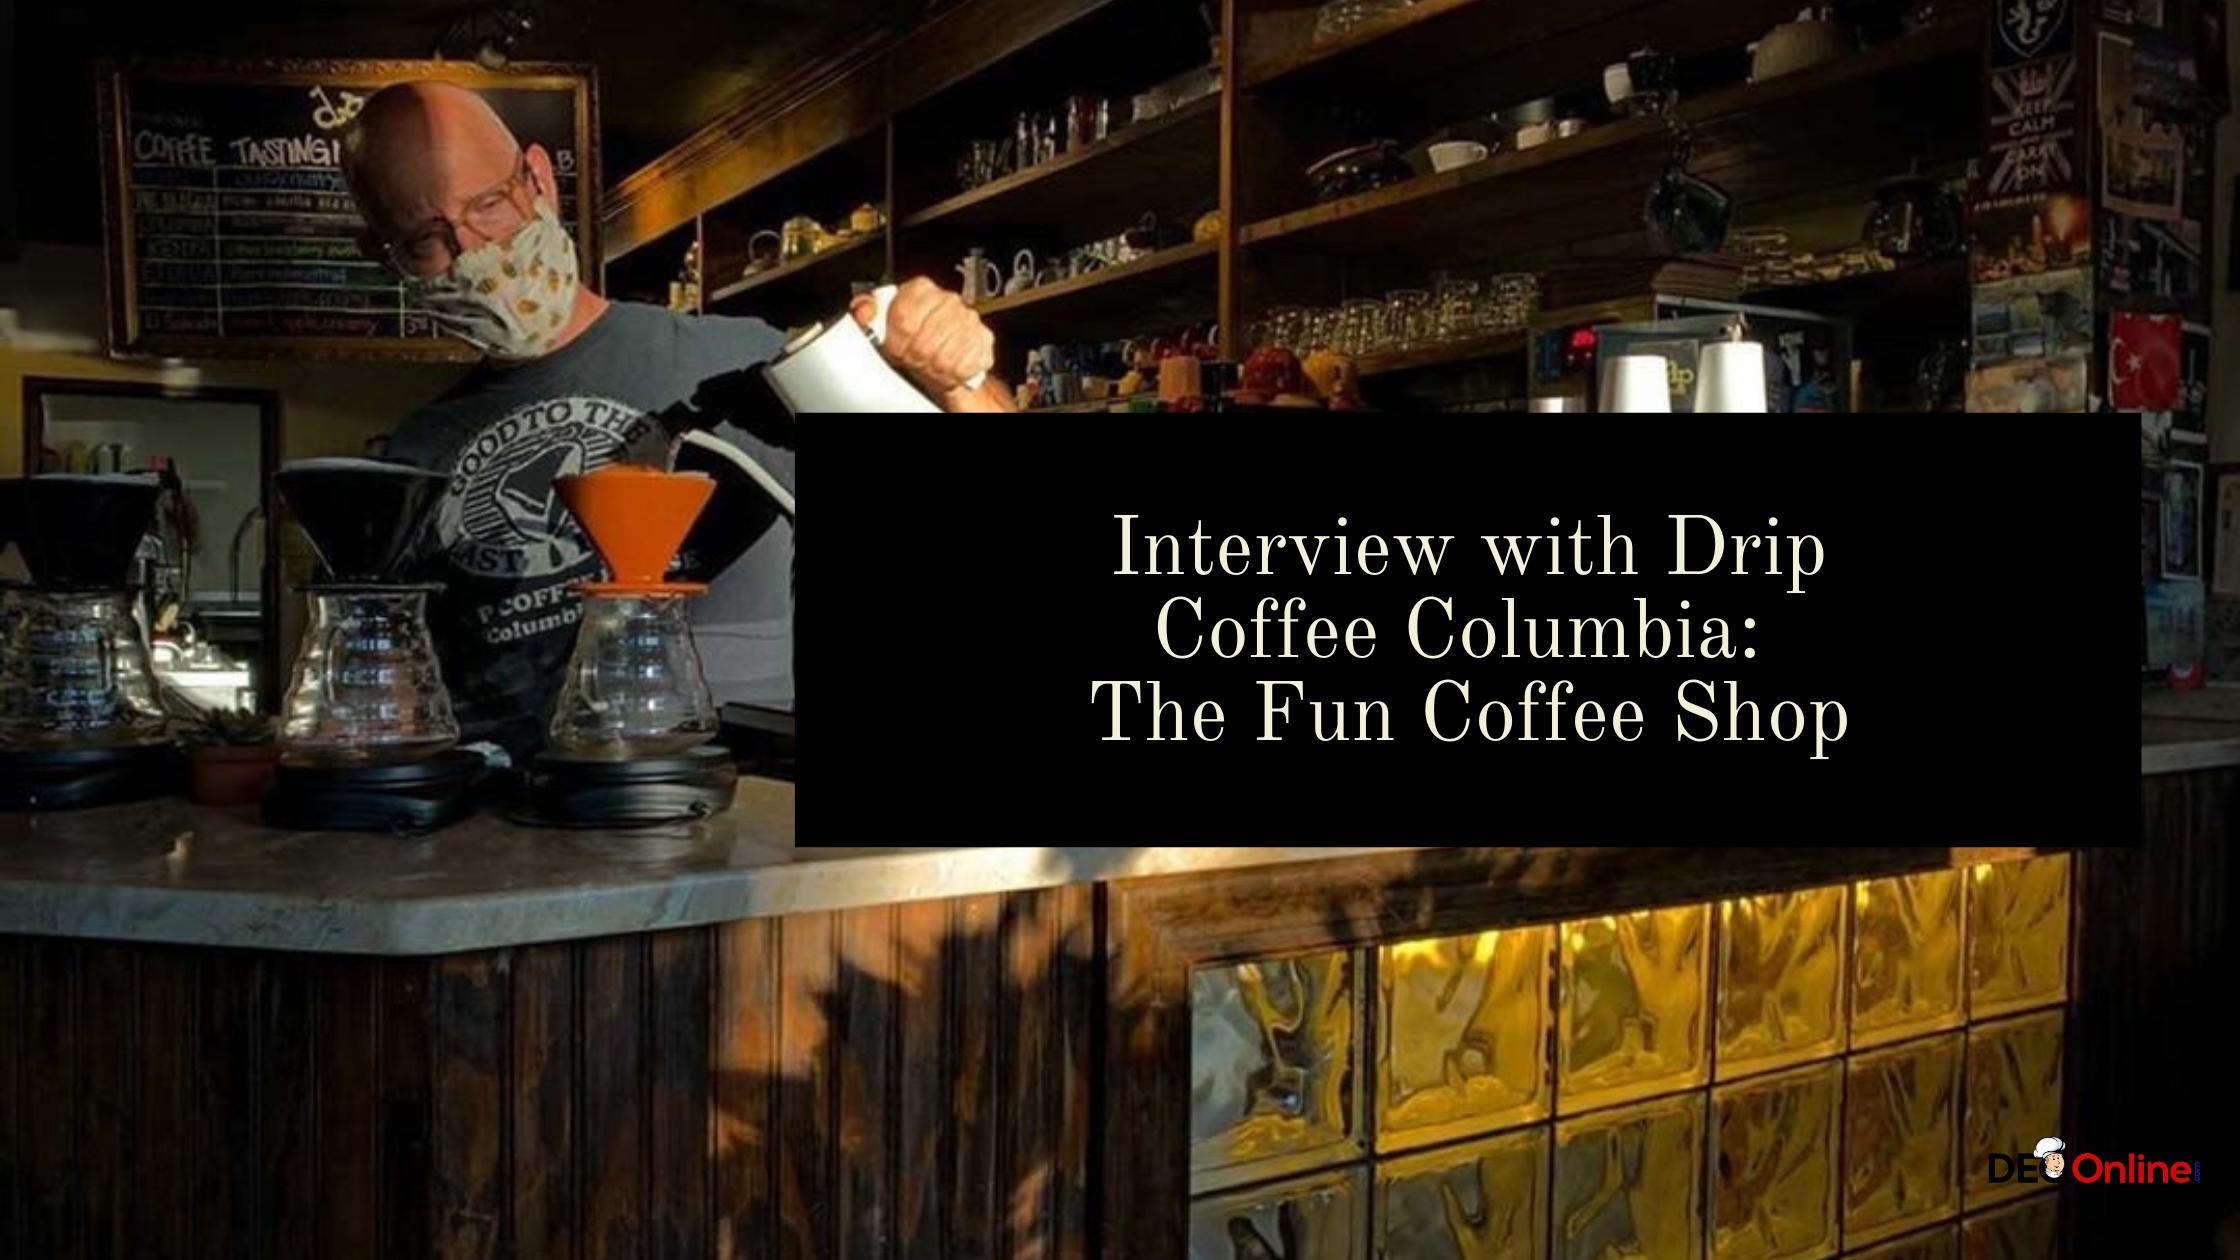 Interview with Drip Coffee Columbia: The Fun Coffee Shop